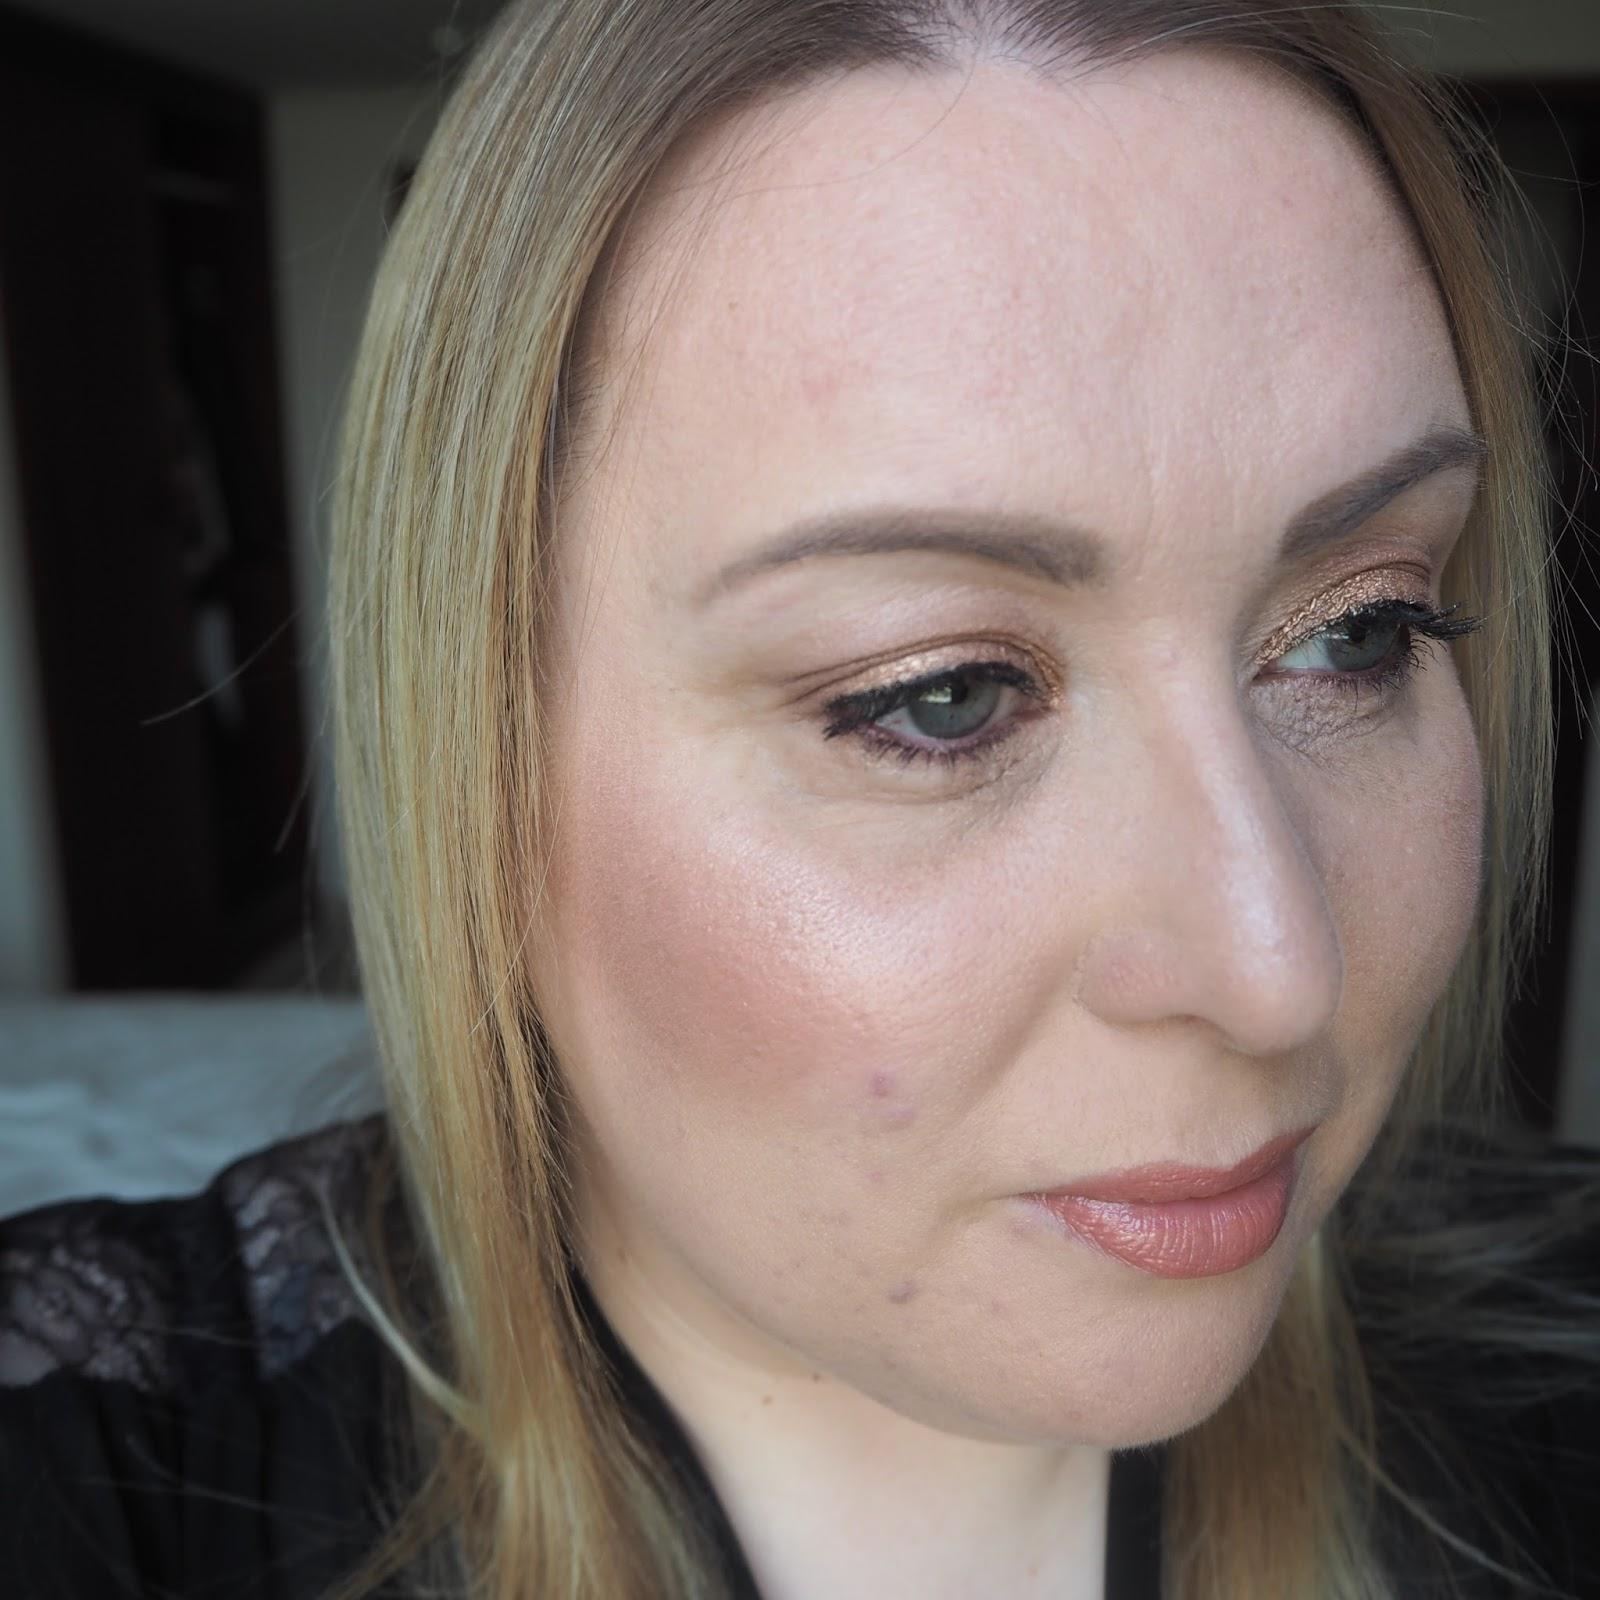 Anastasia Glow Kit in Gleam review Starburst